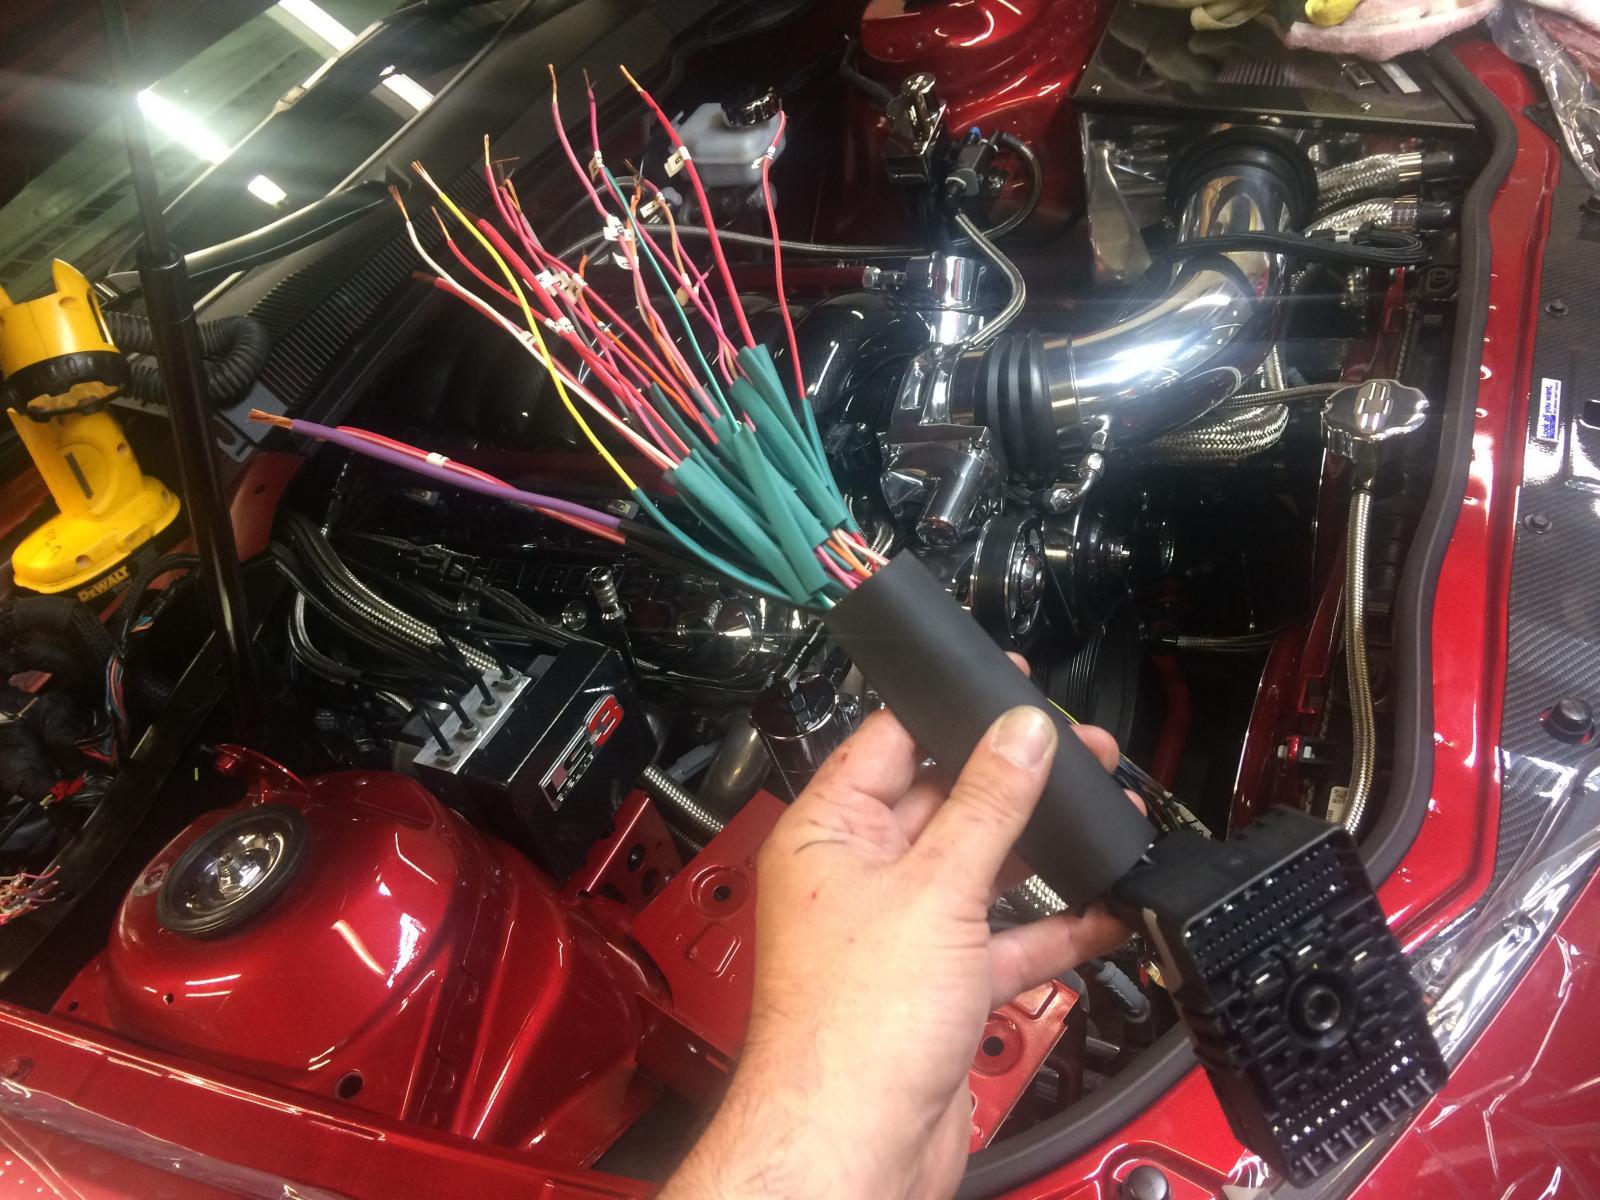 [DIAGRAM_38YU]  Relocating fuse box in PCM To the cabin air filter help plz! - Camaro5  Chevy Camaro Forum / Camaro ZL1, SS and V6 Forums - Camaro5.com   Fuse Box Relocation      Camaro5.com